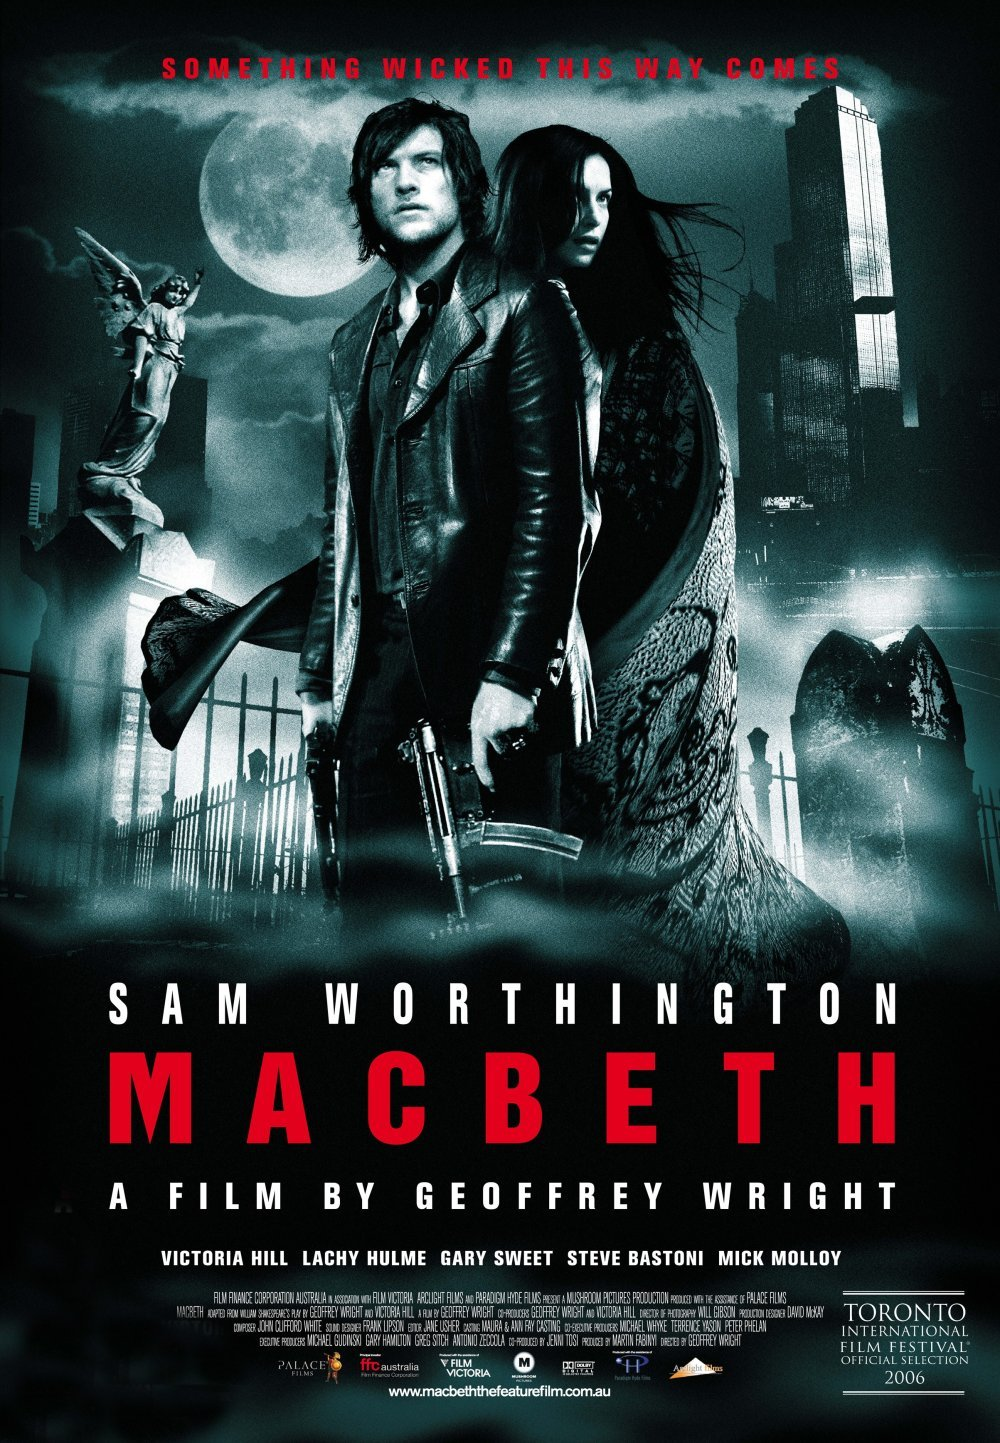 macbeth movie poster movieposteraddict